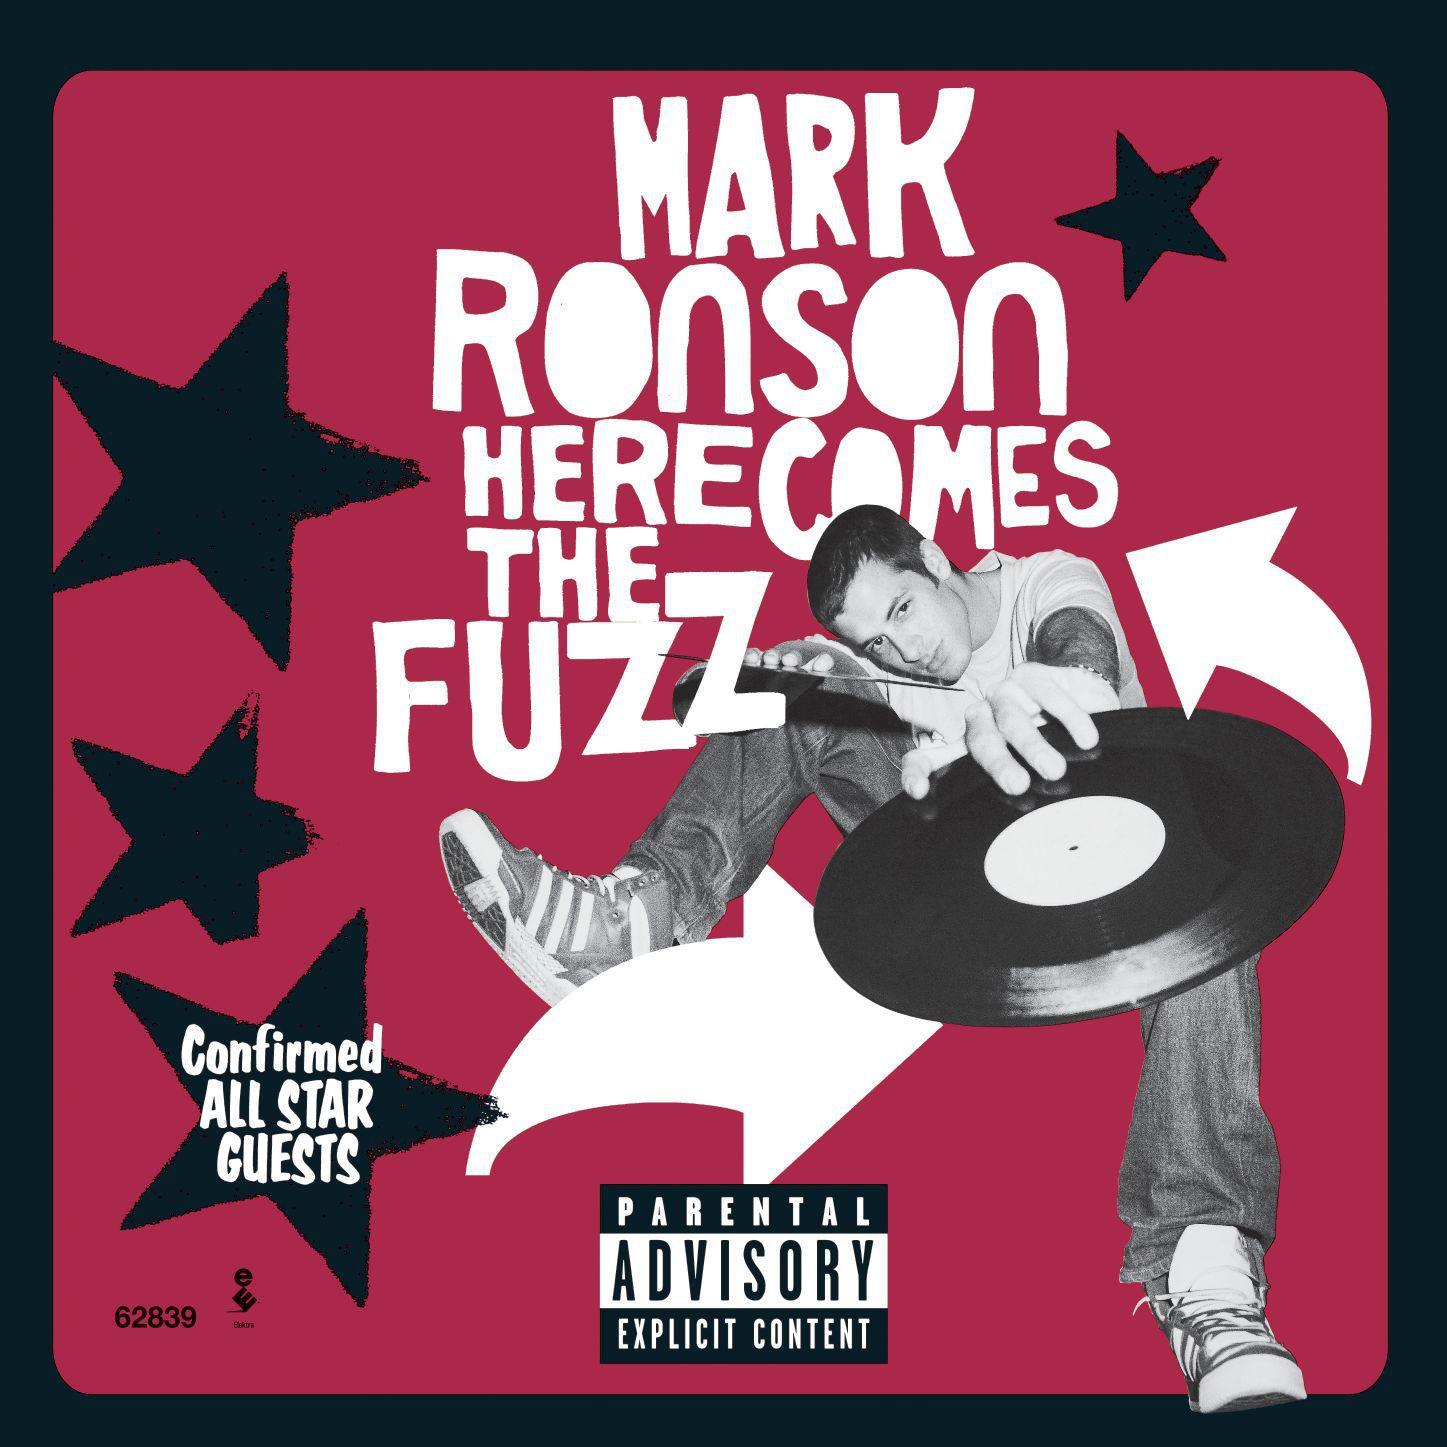 Mark Ronson - Here Comes The Fuzz album cover